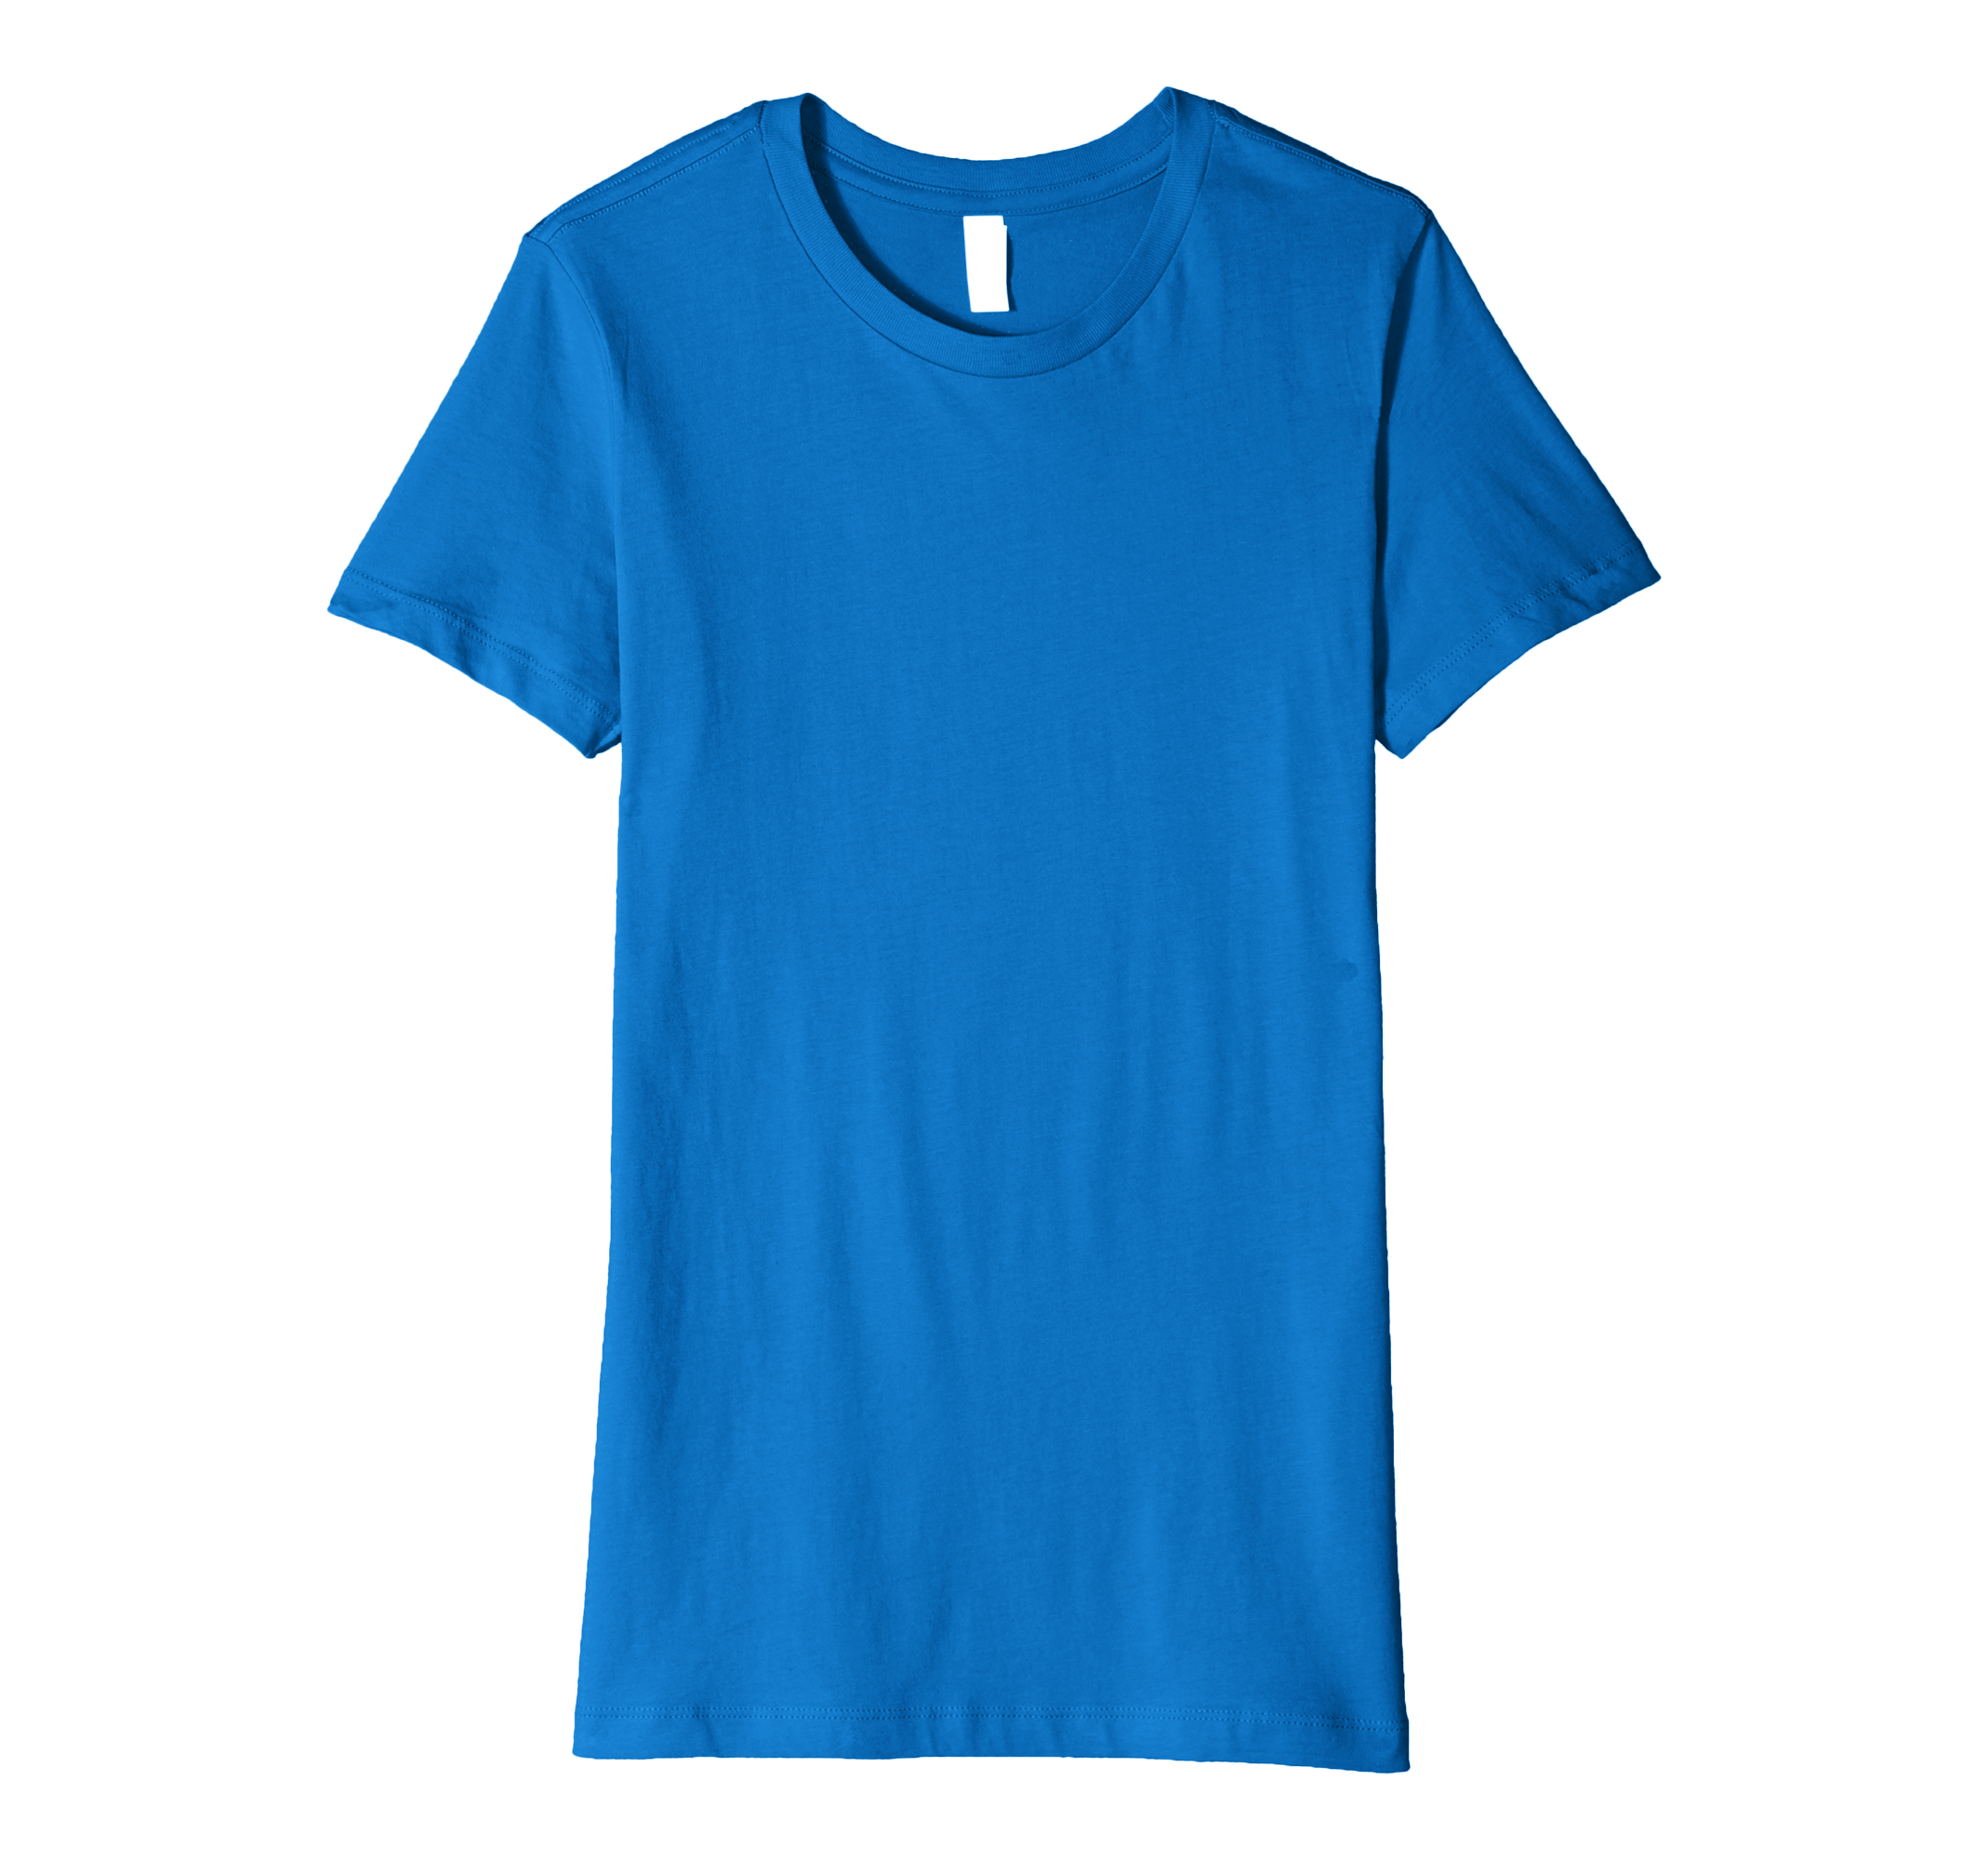 Bernie 2020 Youth/'s T-Shirt Sanders For President Feel The Bern Shirts